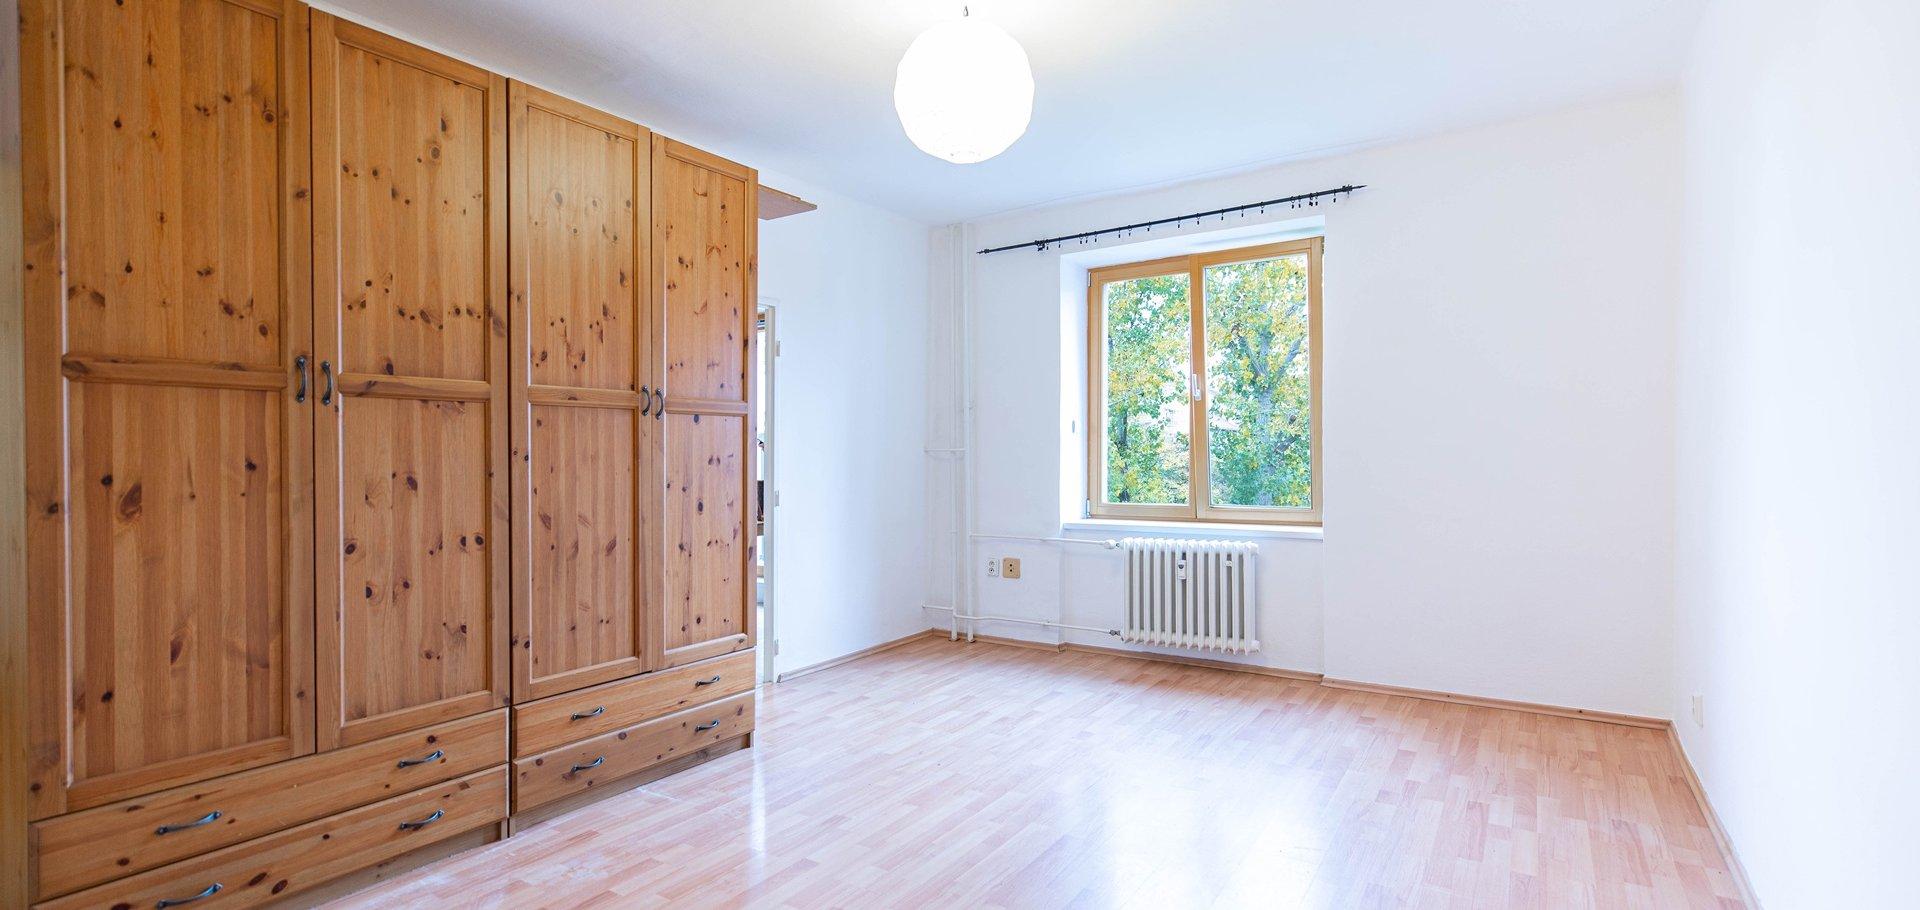 Pronájem bytu 2+1, 52m², Praha - Vršovice